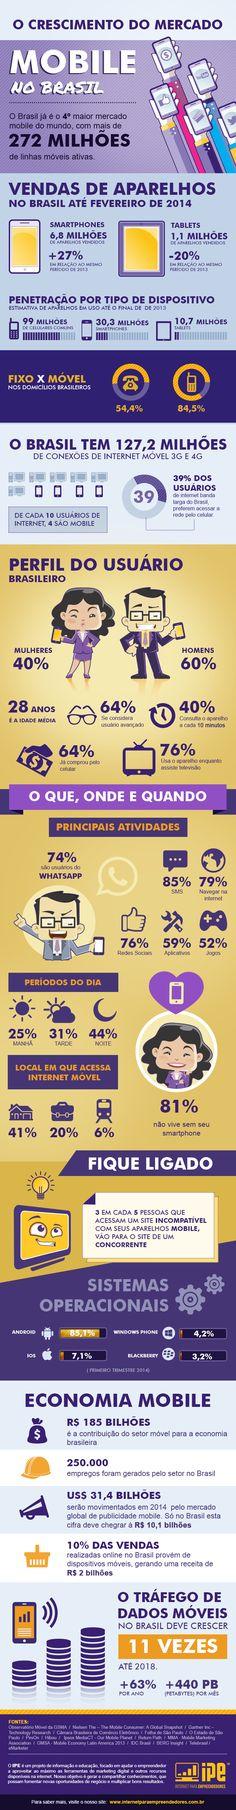 O Crescimento do Mercado Mobile no Brasil